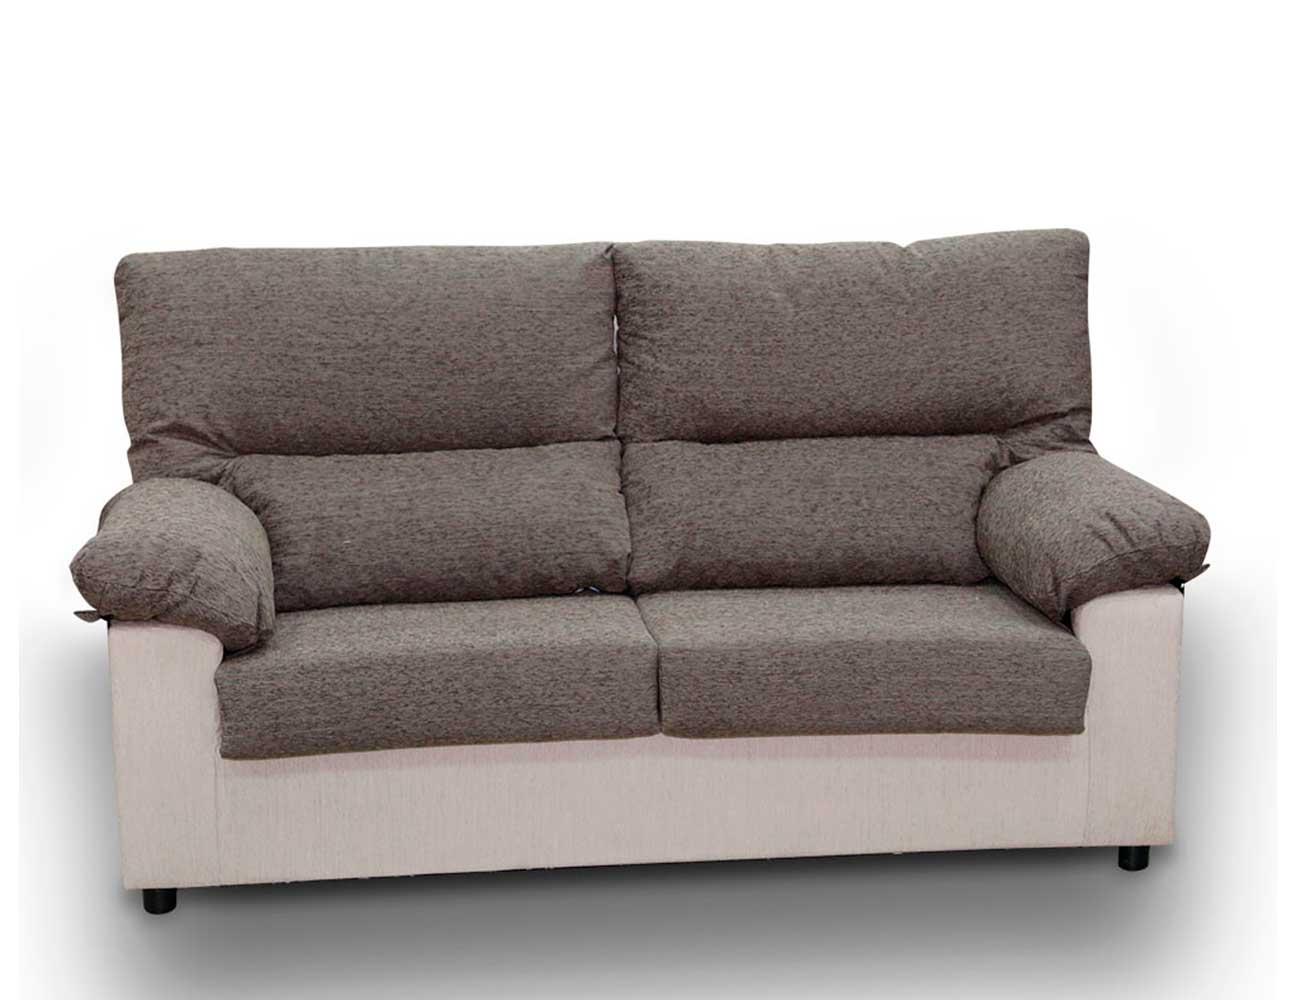 Sofa 3 plazas barato22